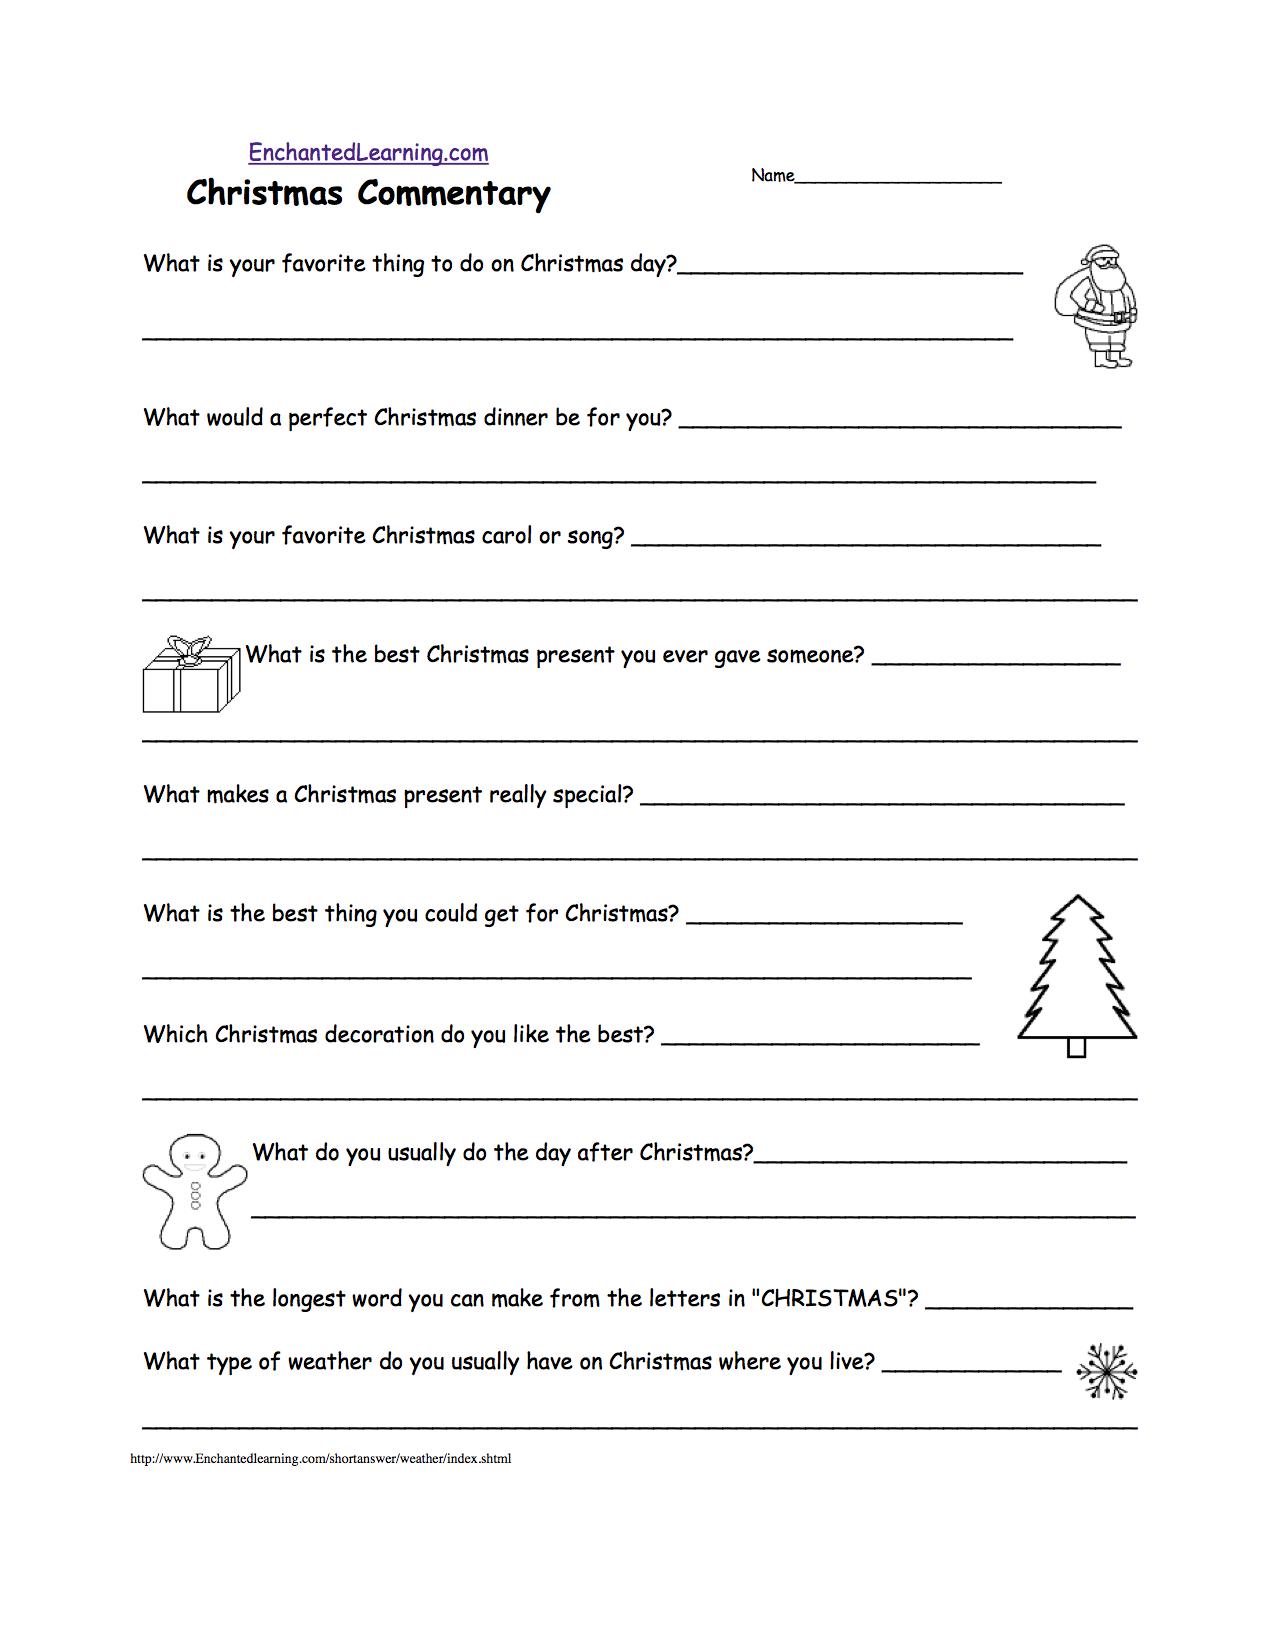 Christmas Commentary - Short Answer Worksheet